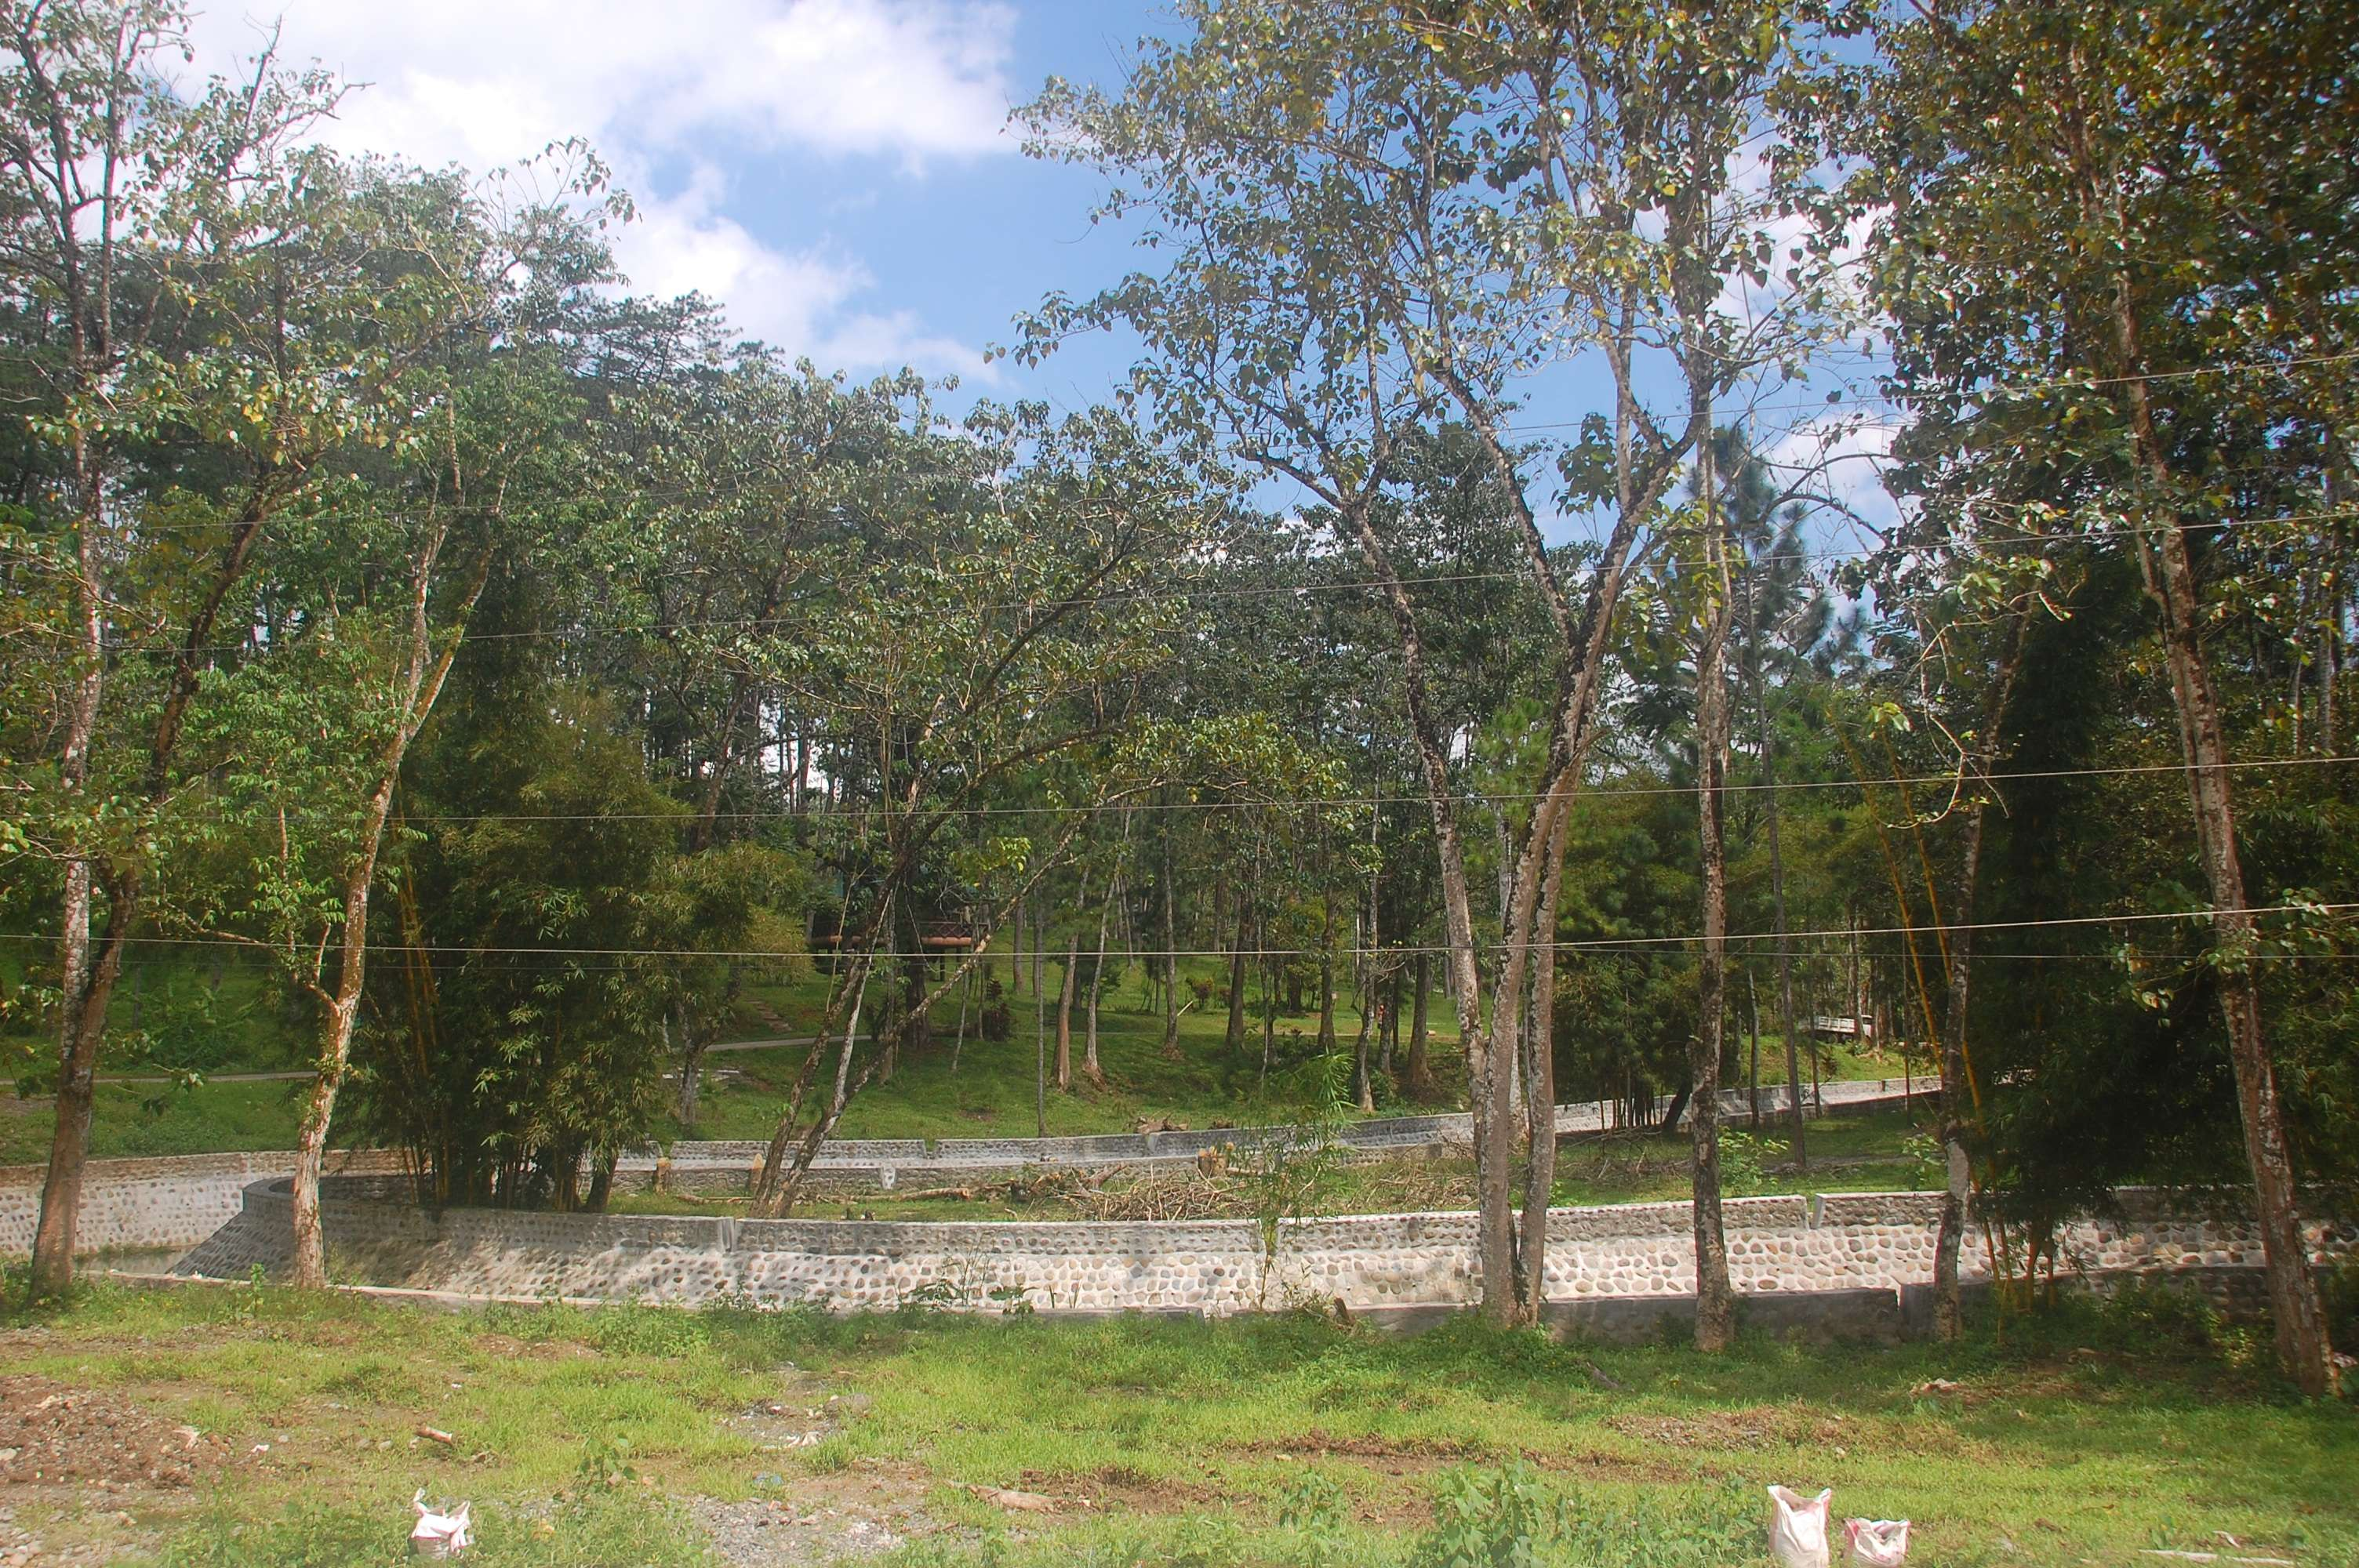 kaamulan grounds malaybalay bukidnon